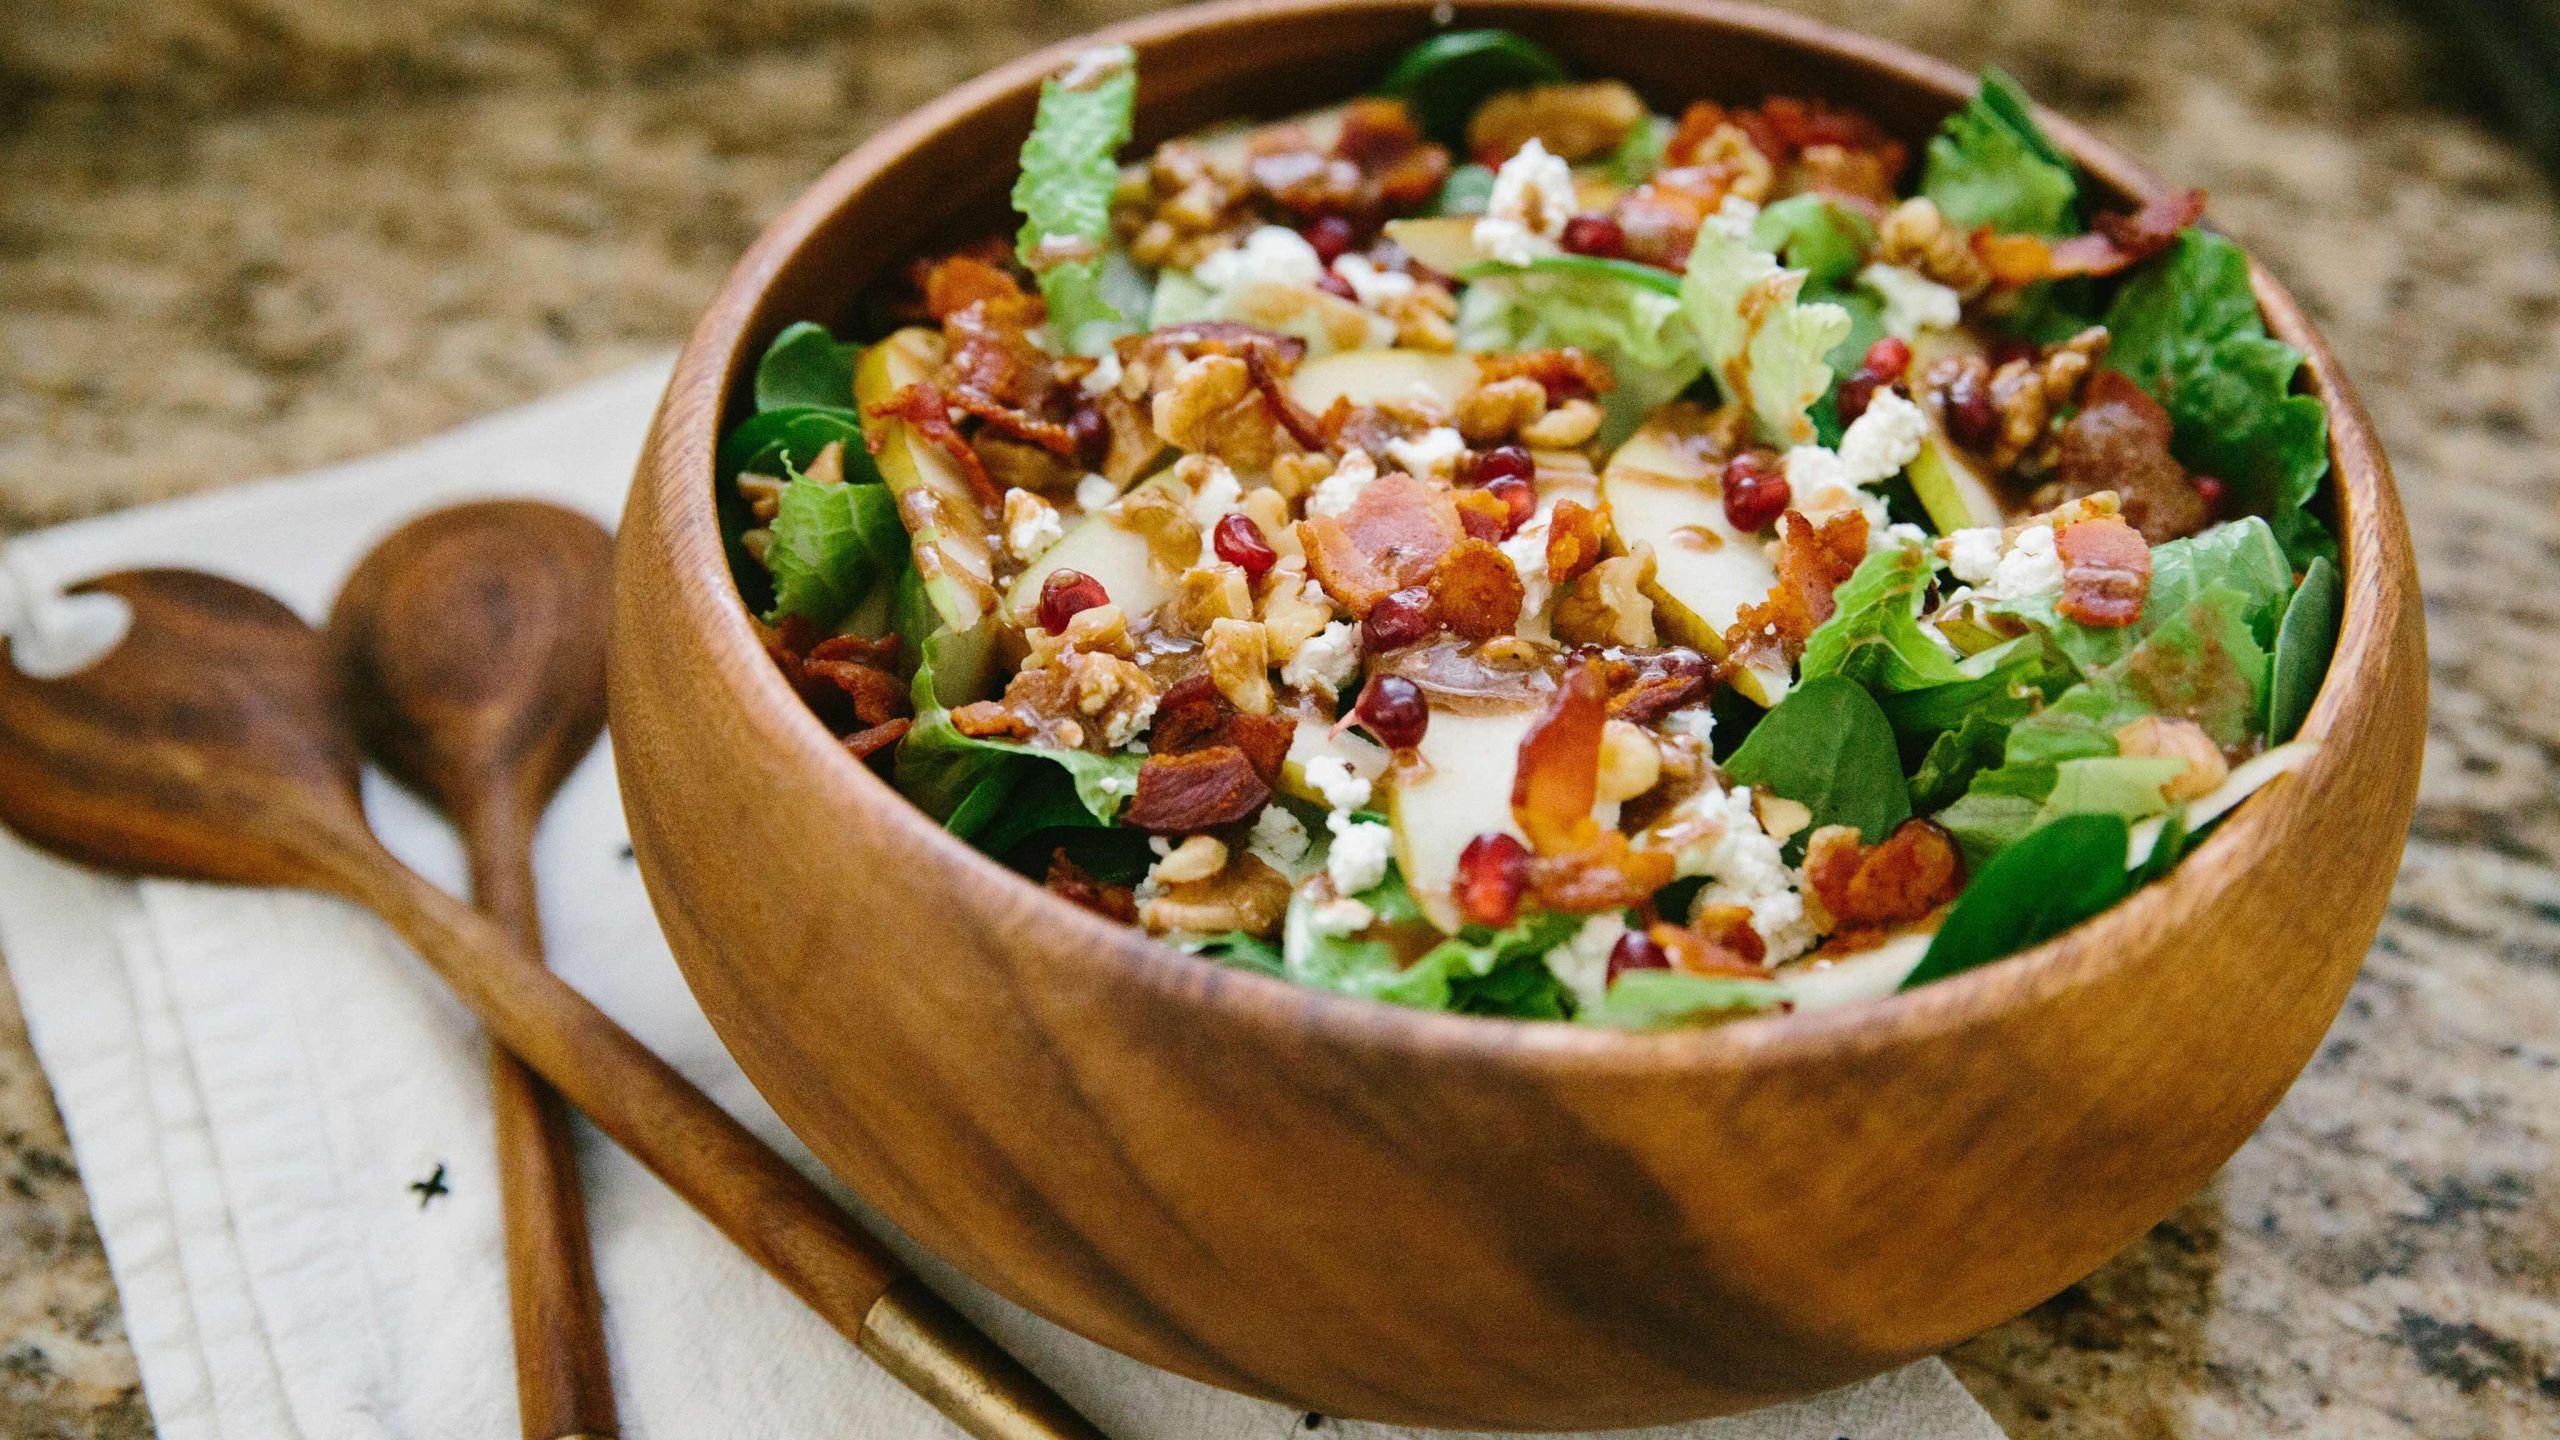 Heart Healthy Winter Recipes  Bacon Berry Winter Salad Recipe